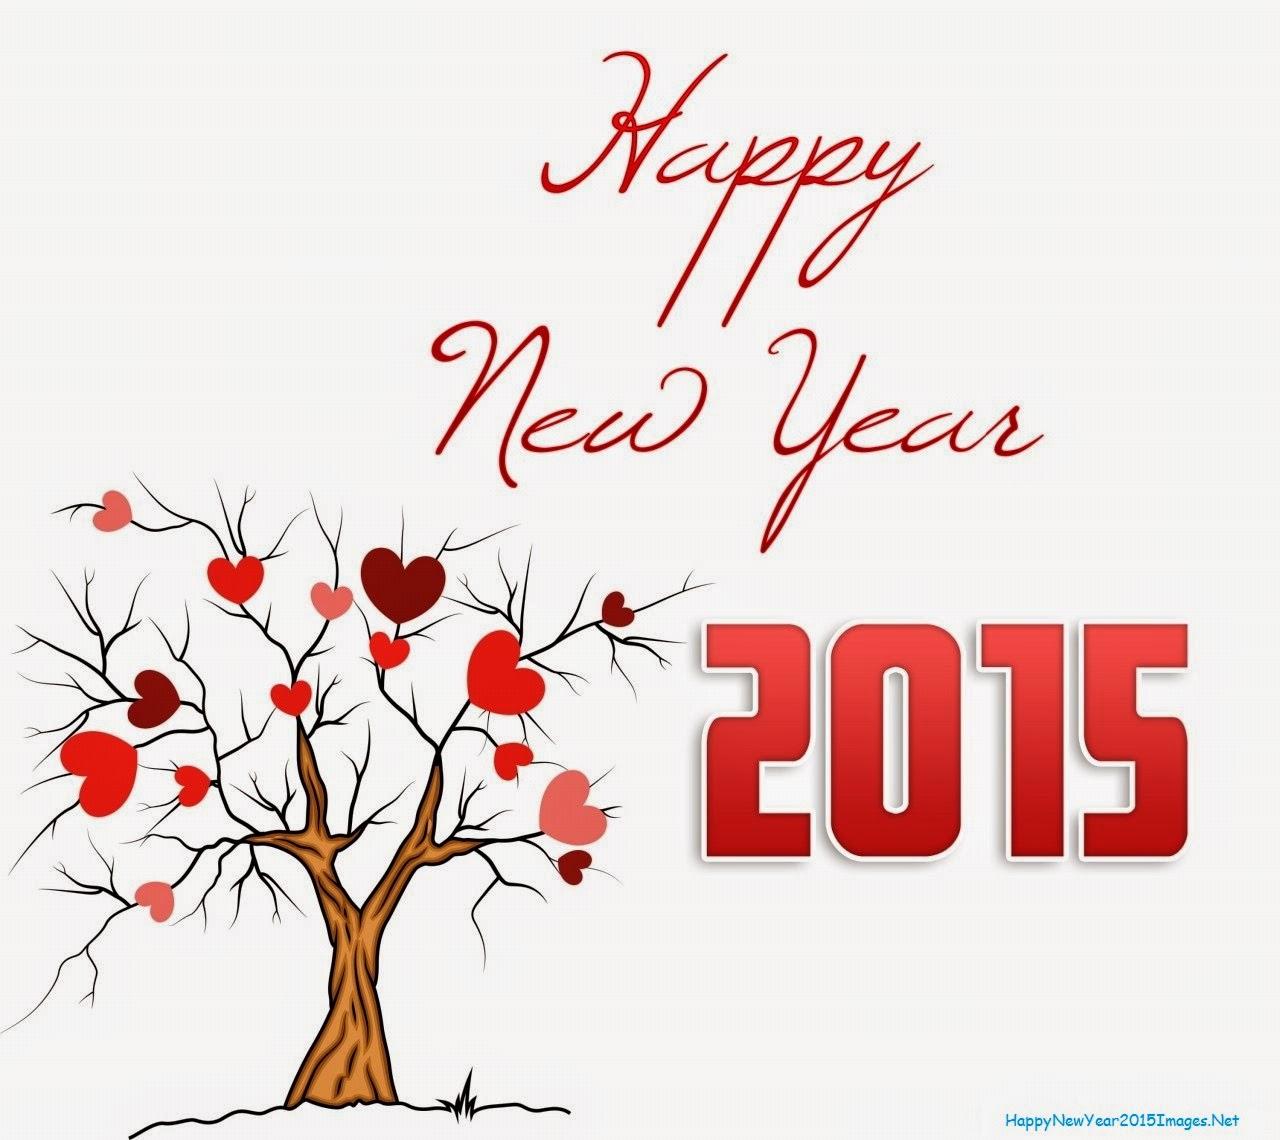 Love Happy New Year 2015 Wallpaper Desktop 548298   Ongur 1280x1140